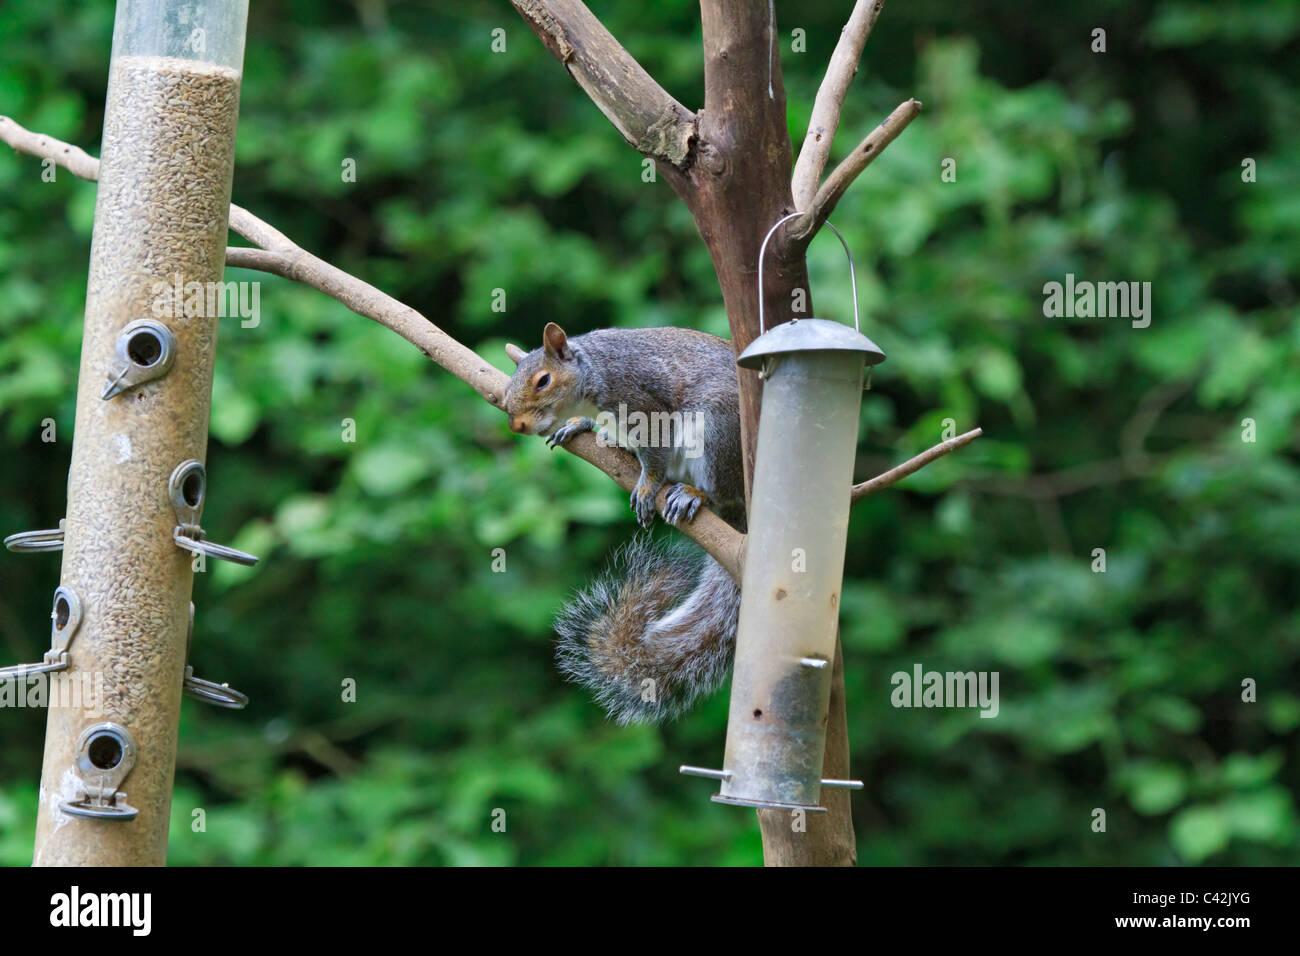 Eastern Grey Squirrel, Sciurus carolinensis, preparing to steal from a bird feeder. - Stock Image